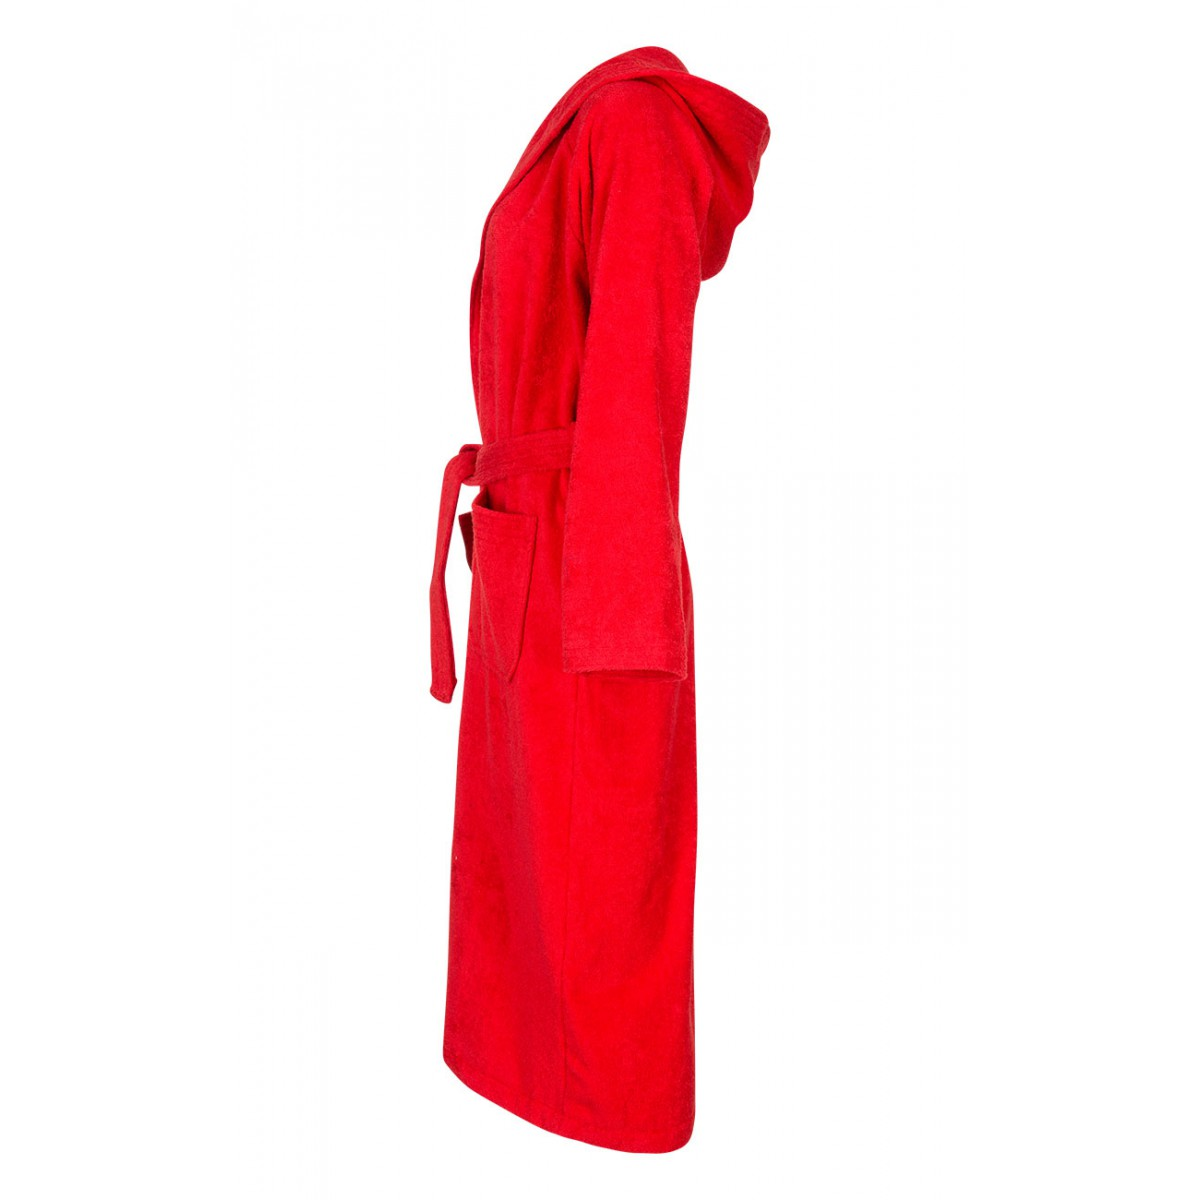 Rode unisex badjas